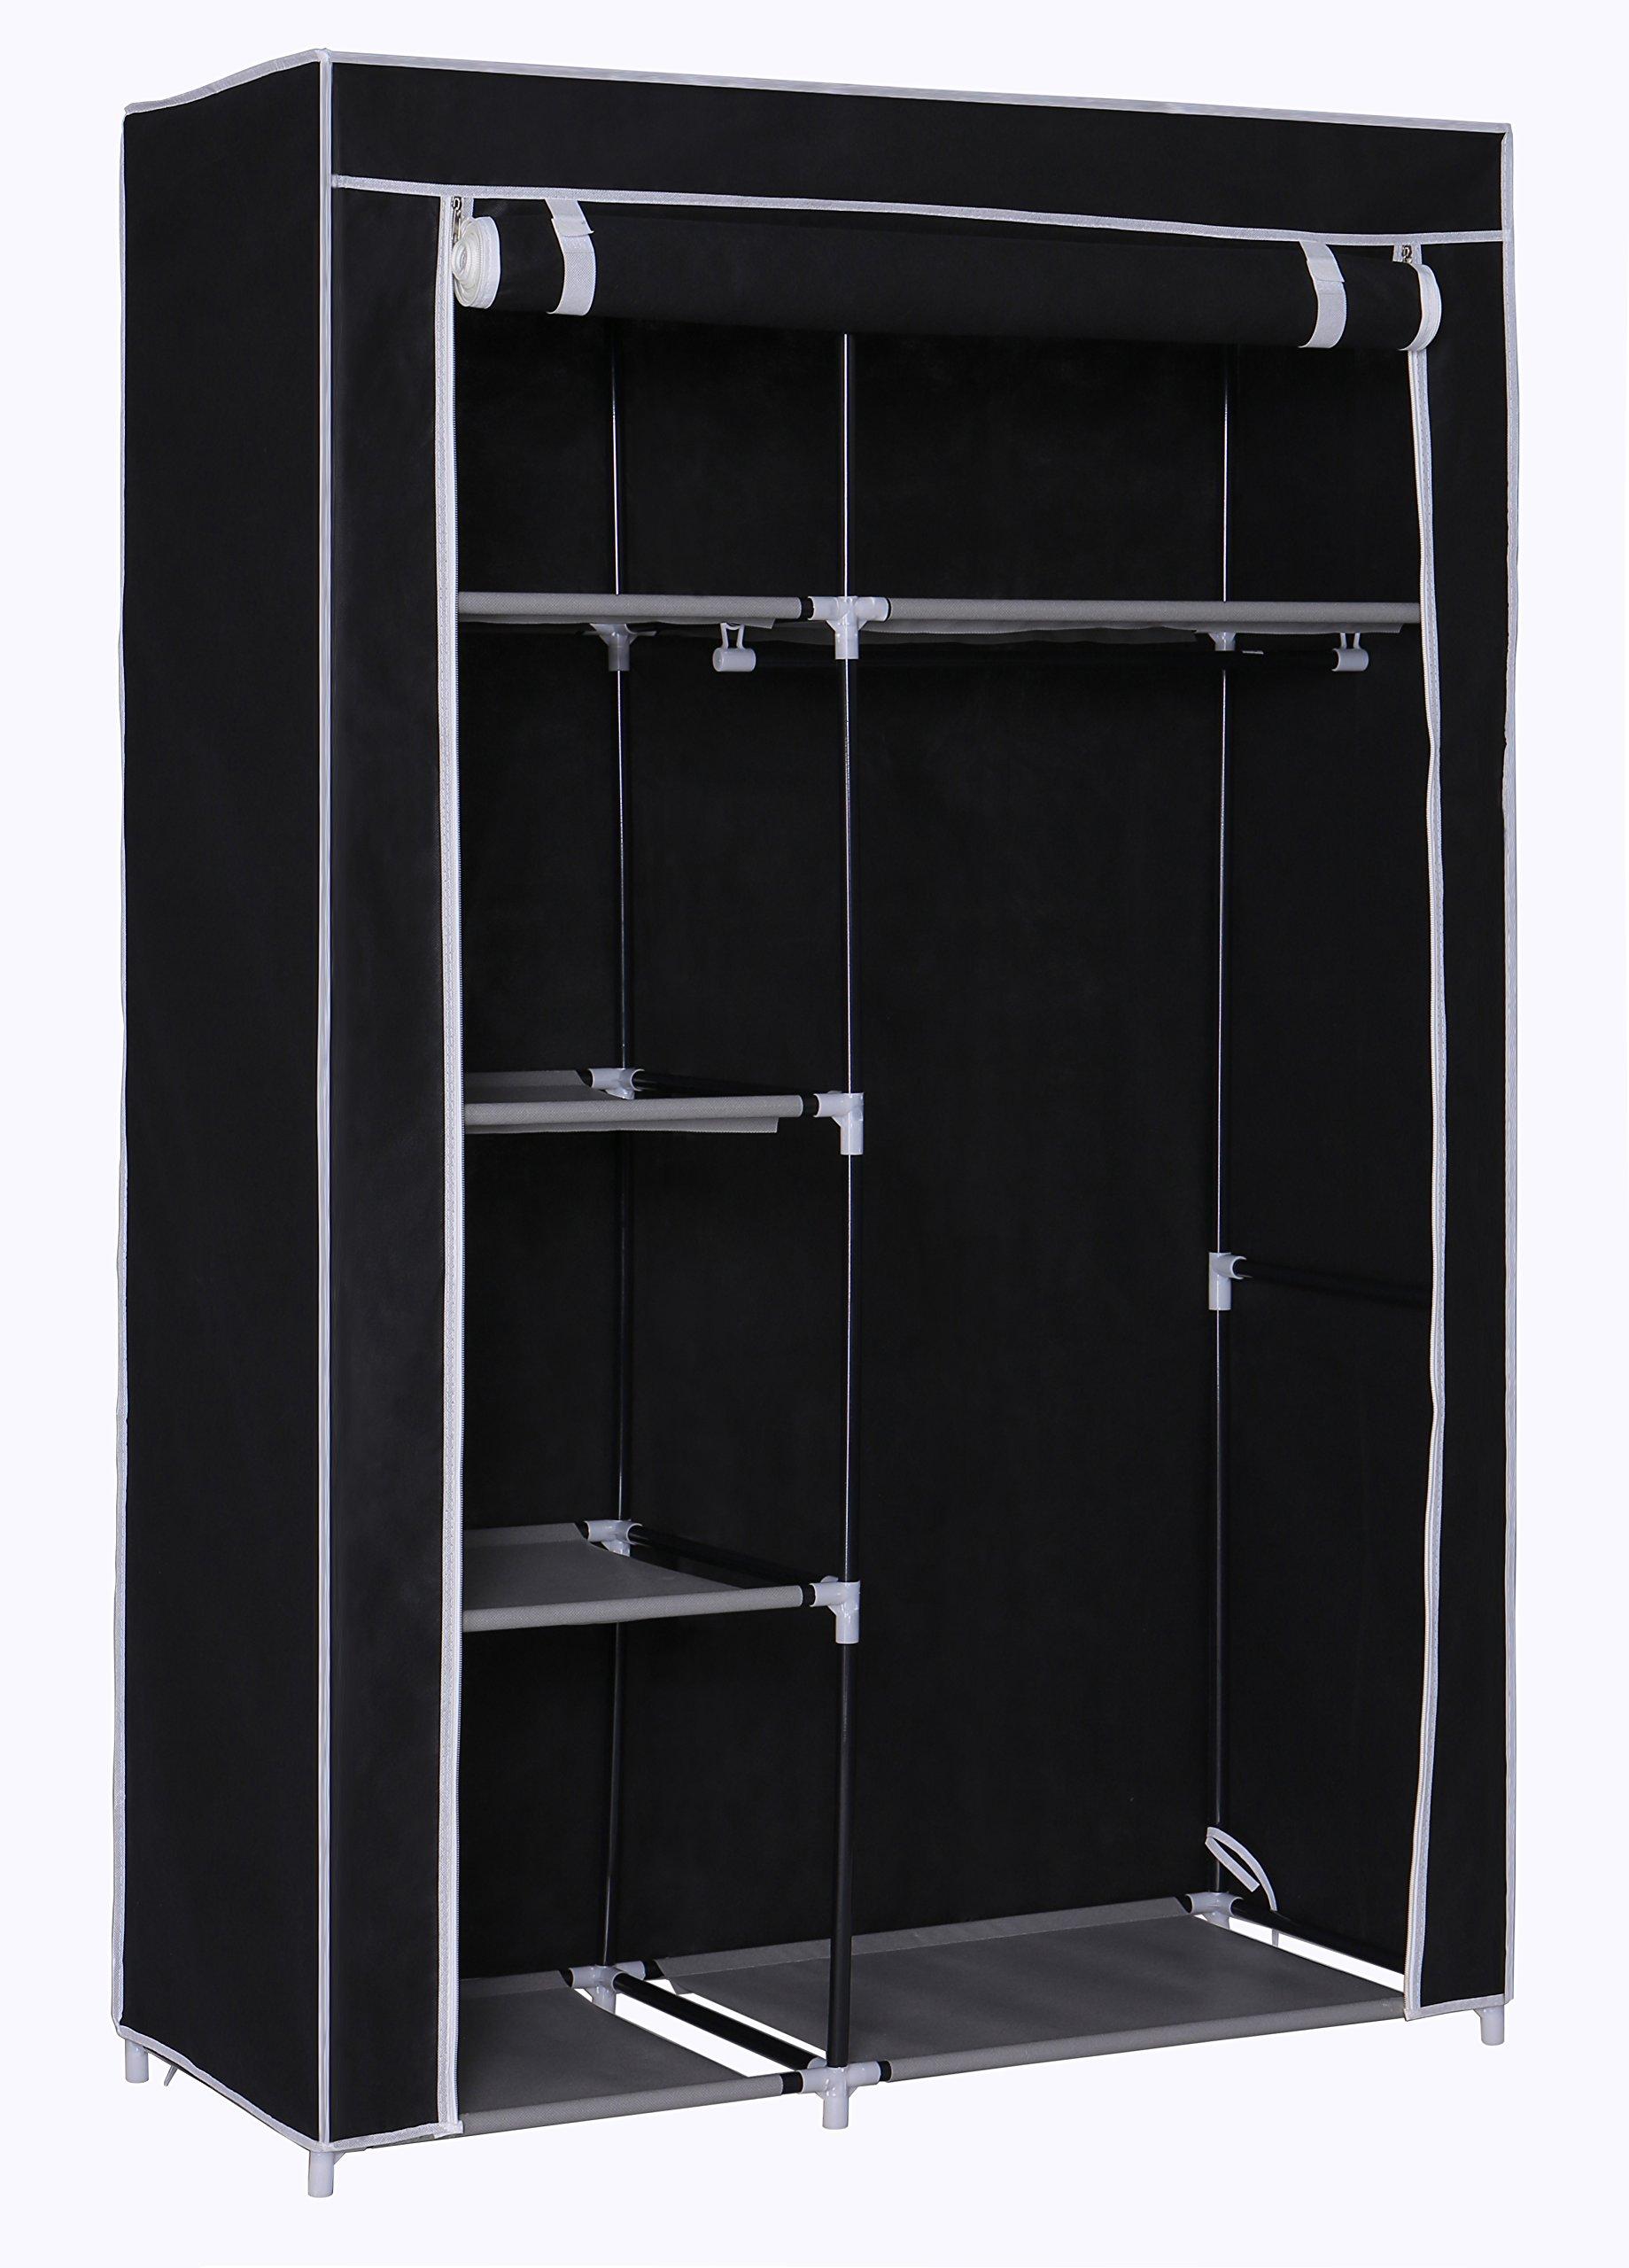 Home-Like Storage Closet Portable Wardrobe Armoire Cabinet Storage Closet Portable Clothes Closets Non-Woven Fabric Wardrobe Clothing Storage Organizer (Closet-Black)